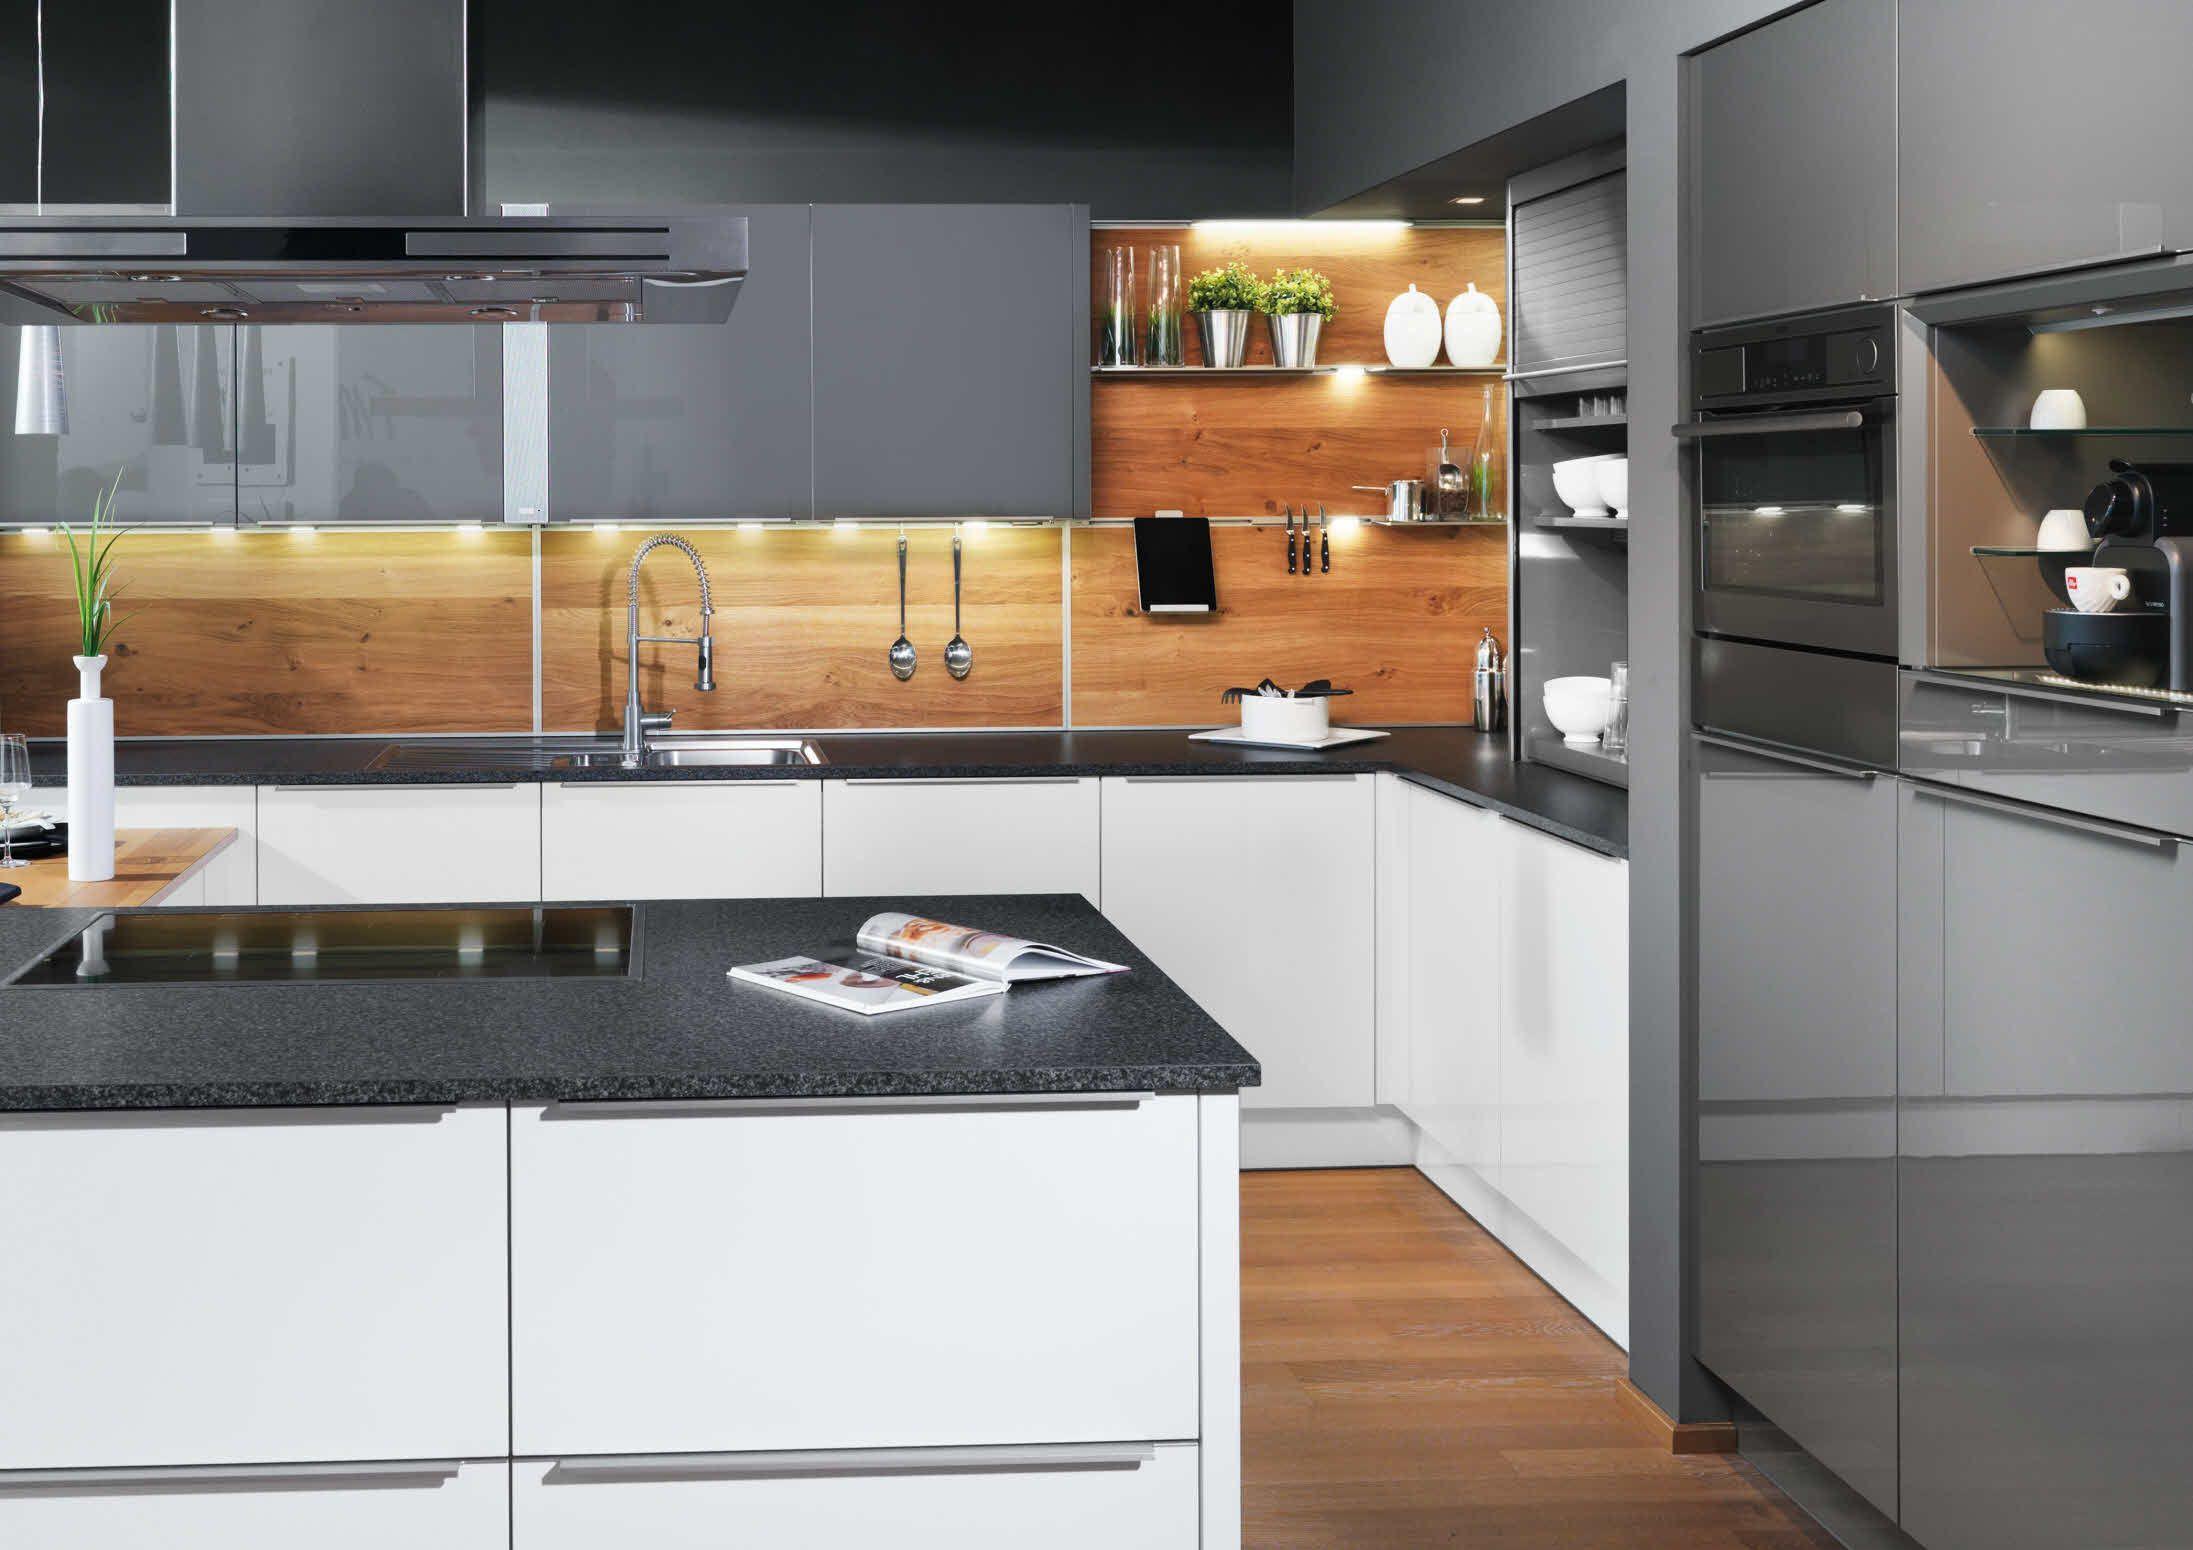 Funktionsrückwand komplett | Nytt kjøkken | Pinterest | Küche